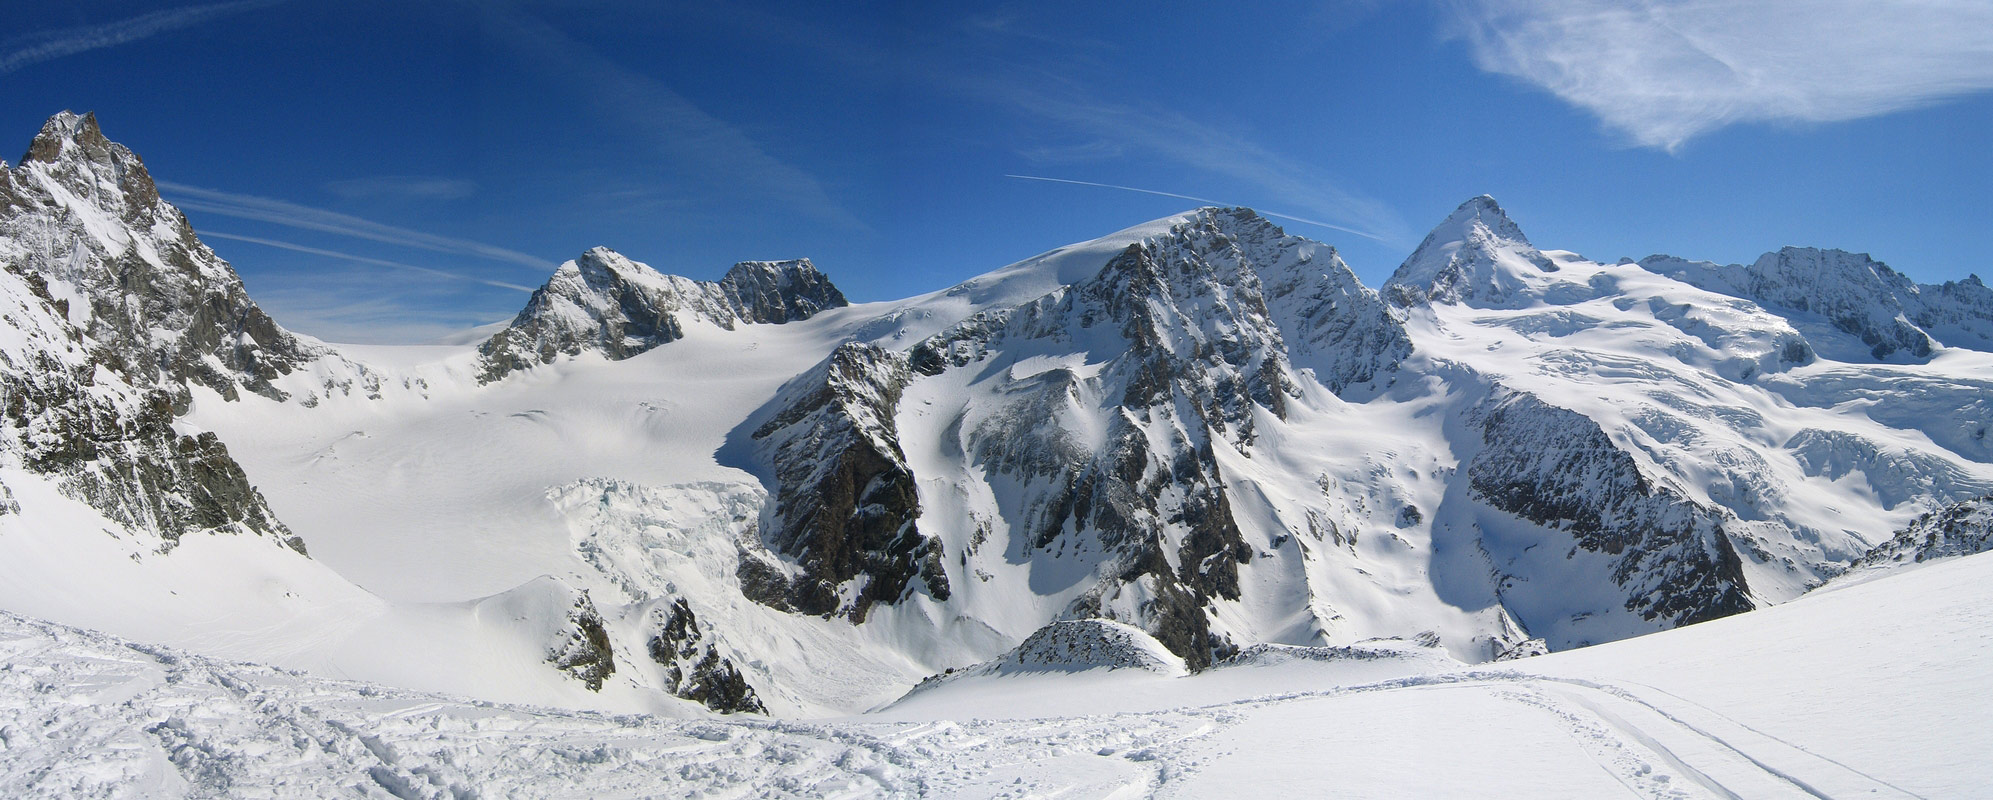 Col Valpelline, Day 6 H.R. Chamonix-Zermatt Walliser Alpen / Alpes valaisannes Švýcarsko panorama 40